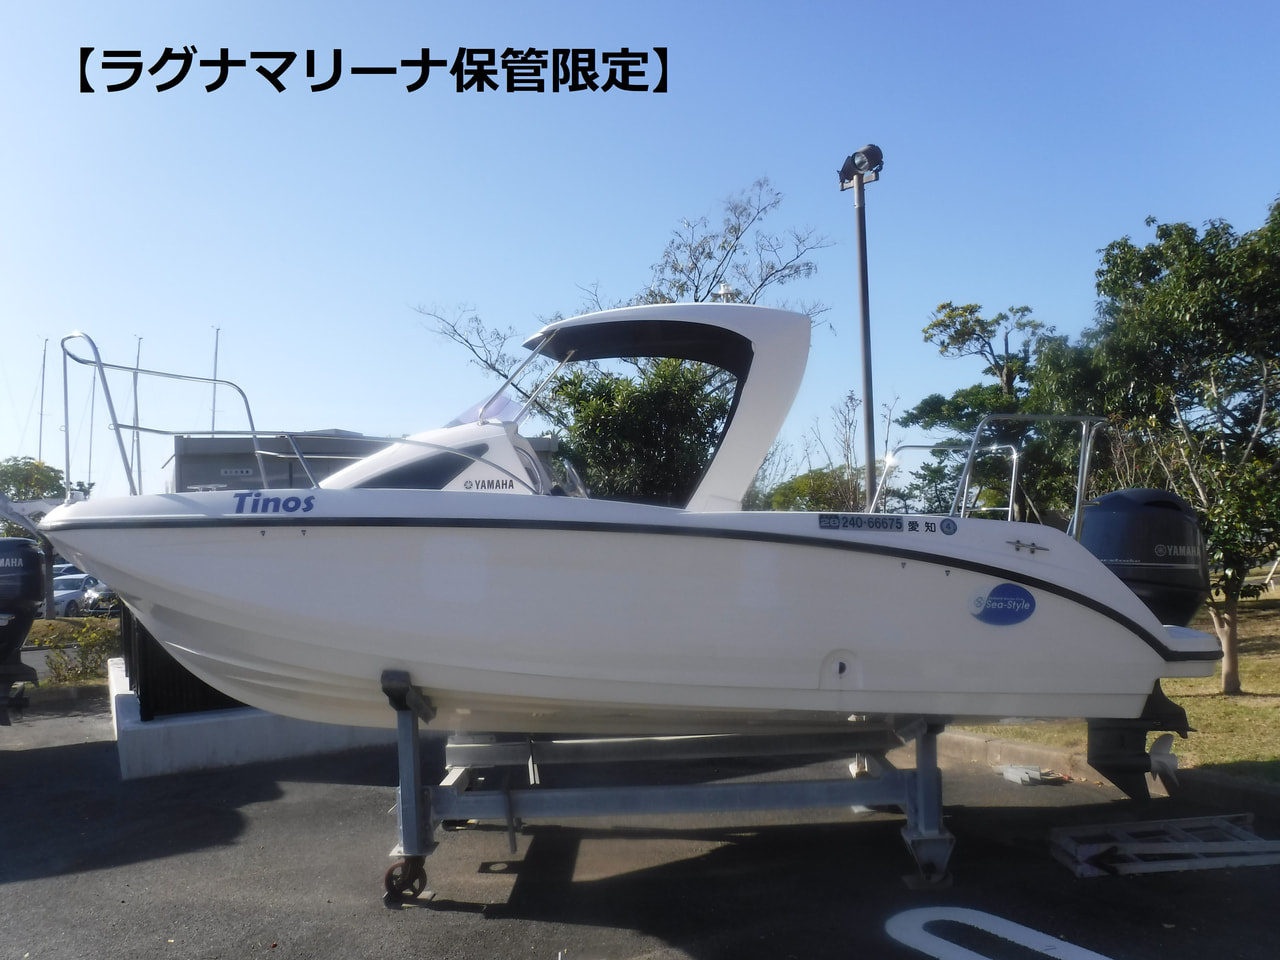 SR-X F115【ラグナマリーナ保管限定】